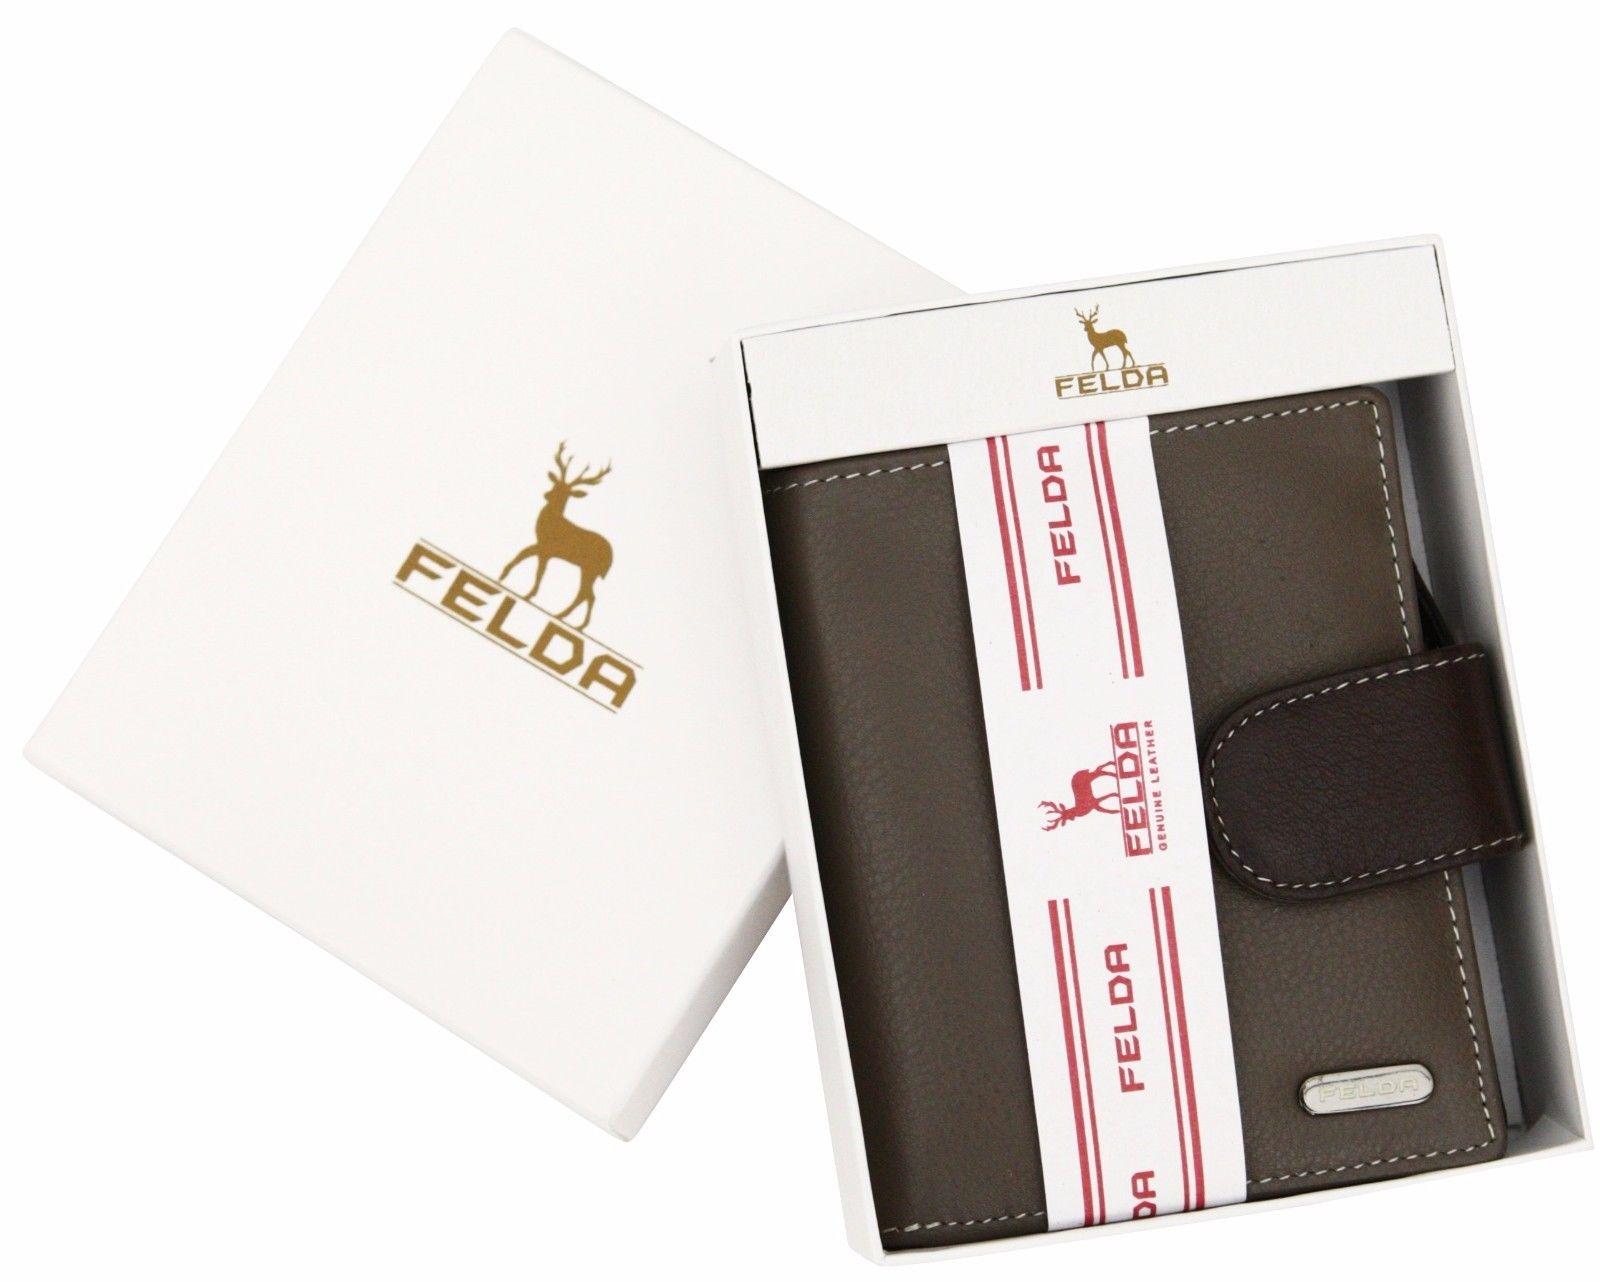 Felda-RFID-onorevoli-MEDAGLIA-amp-Card-Purse-Wallet-Genuine-Leather-Multi-SOFT-BOX-REGALO miniatura 55